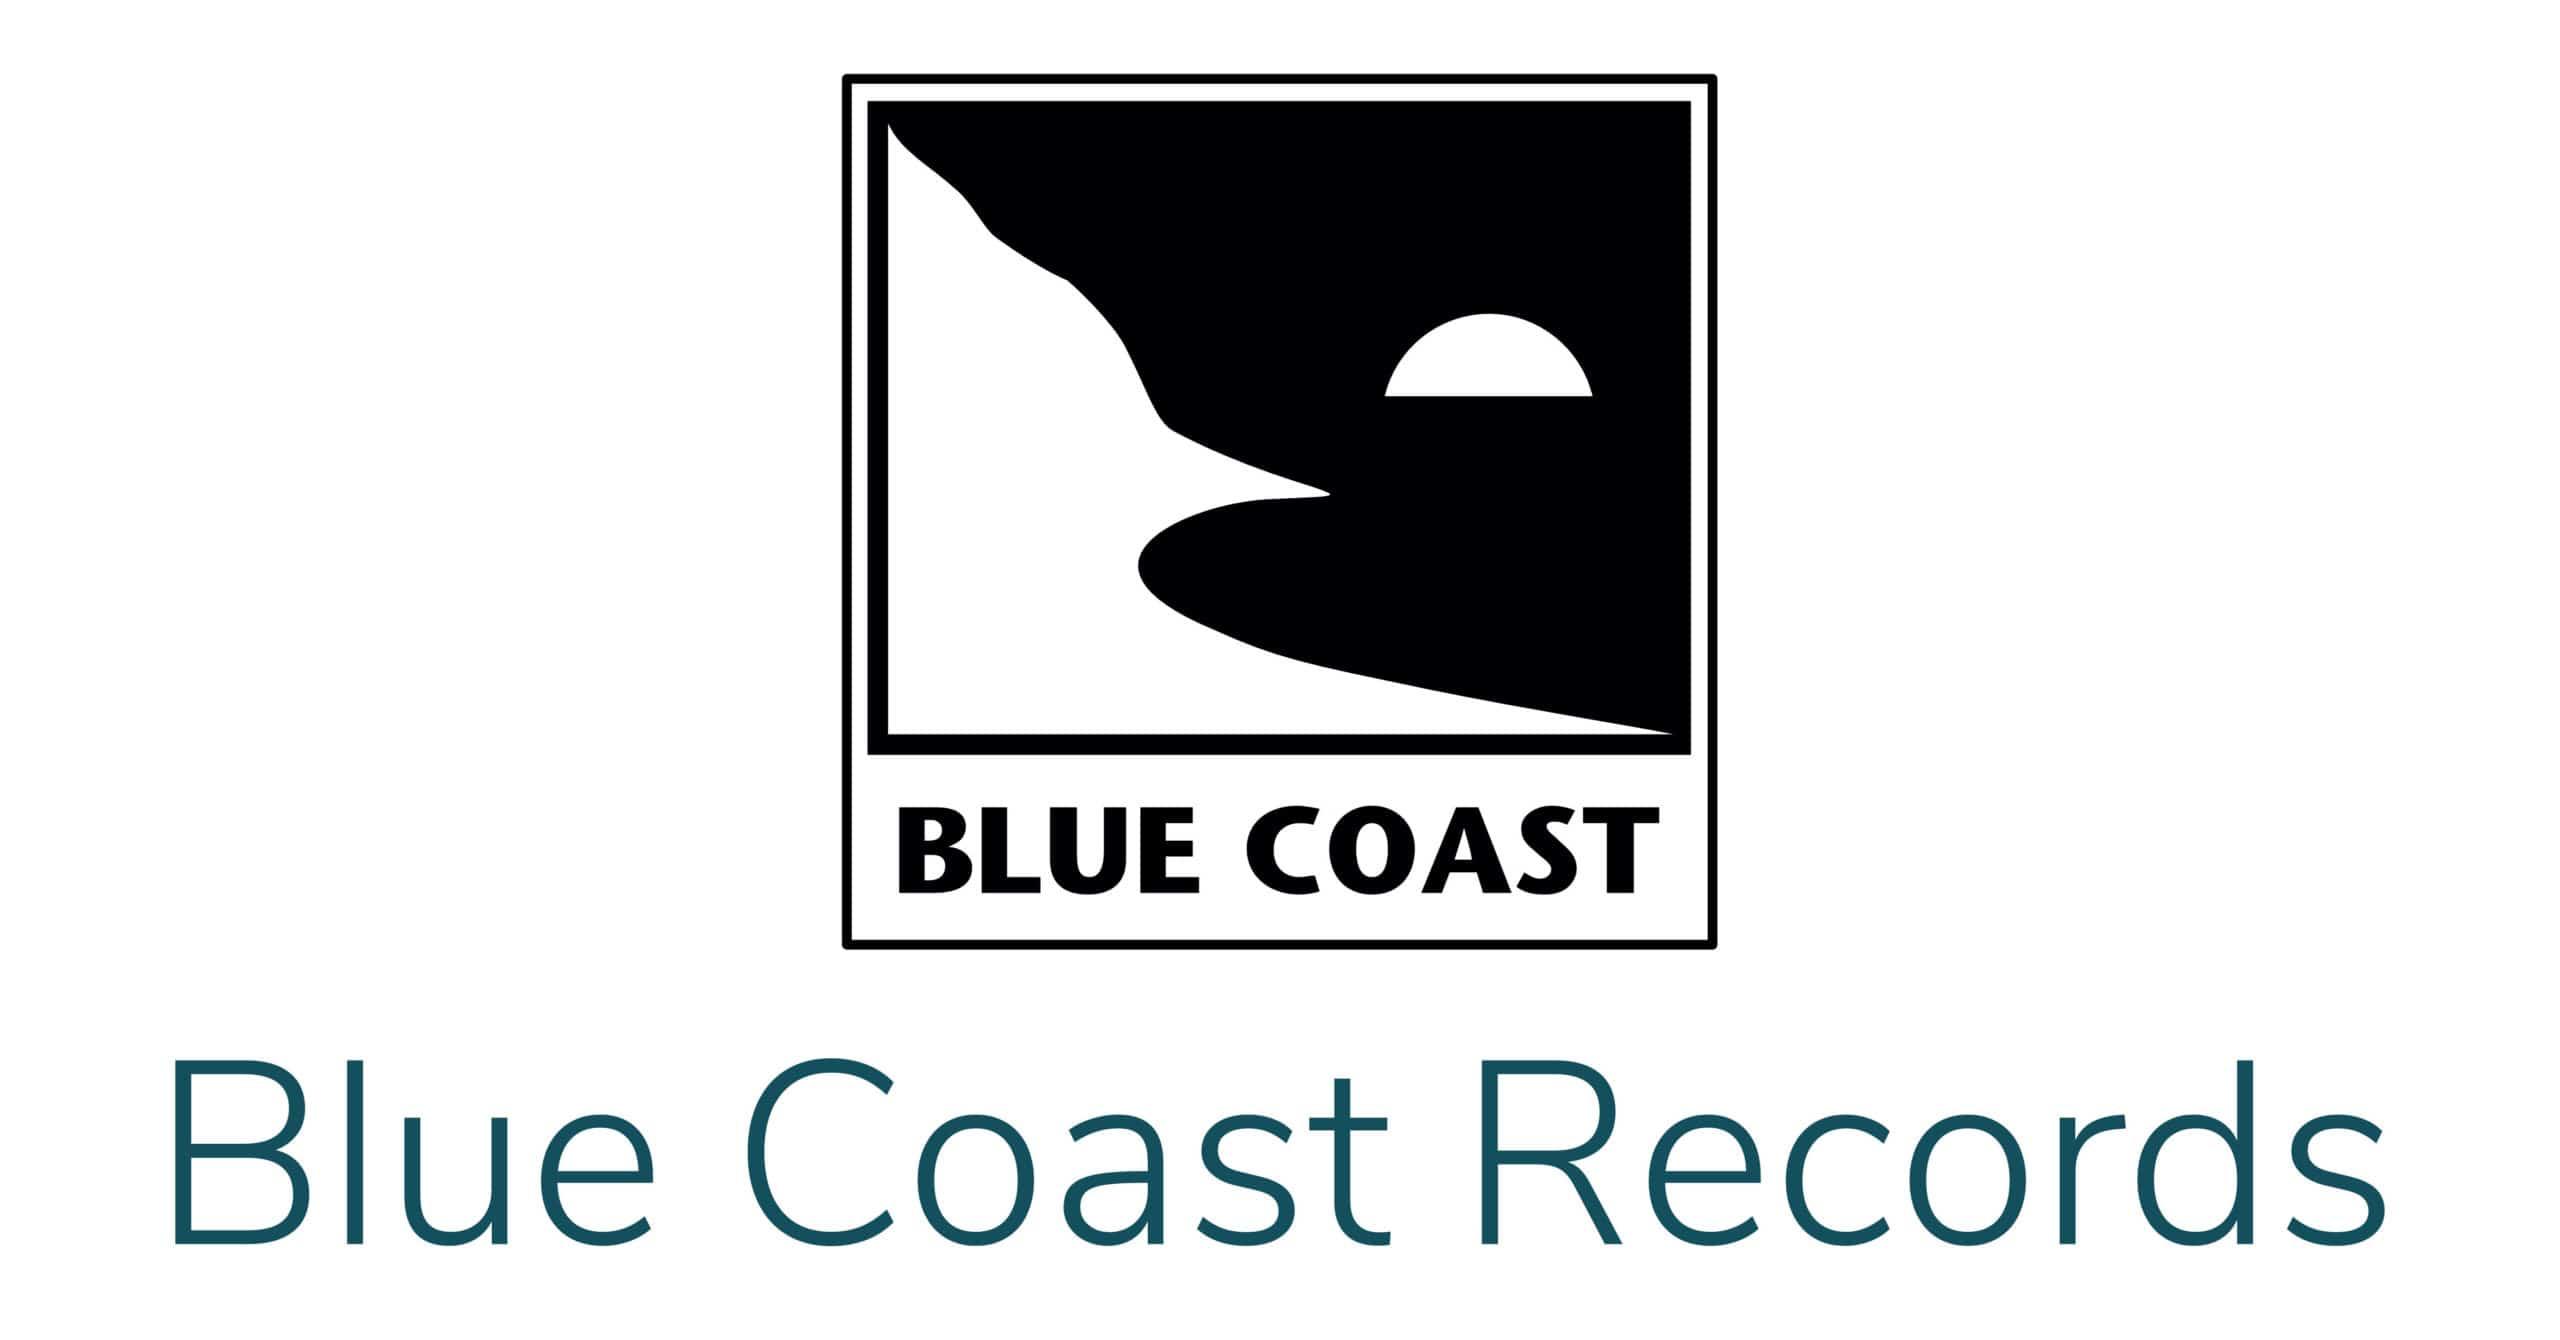 Blue Coast Records